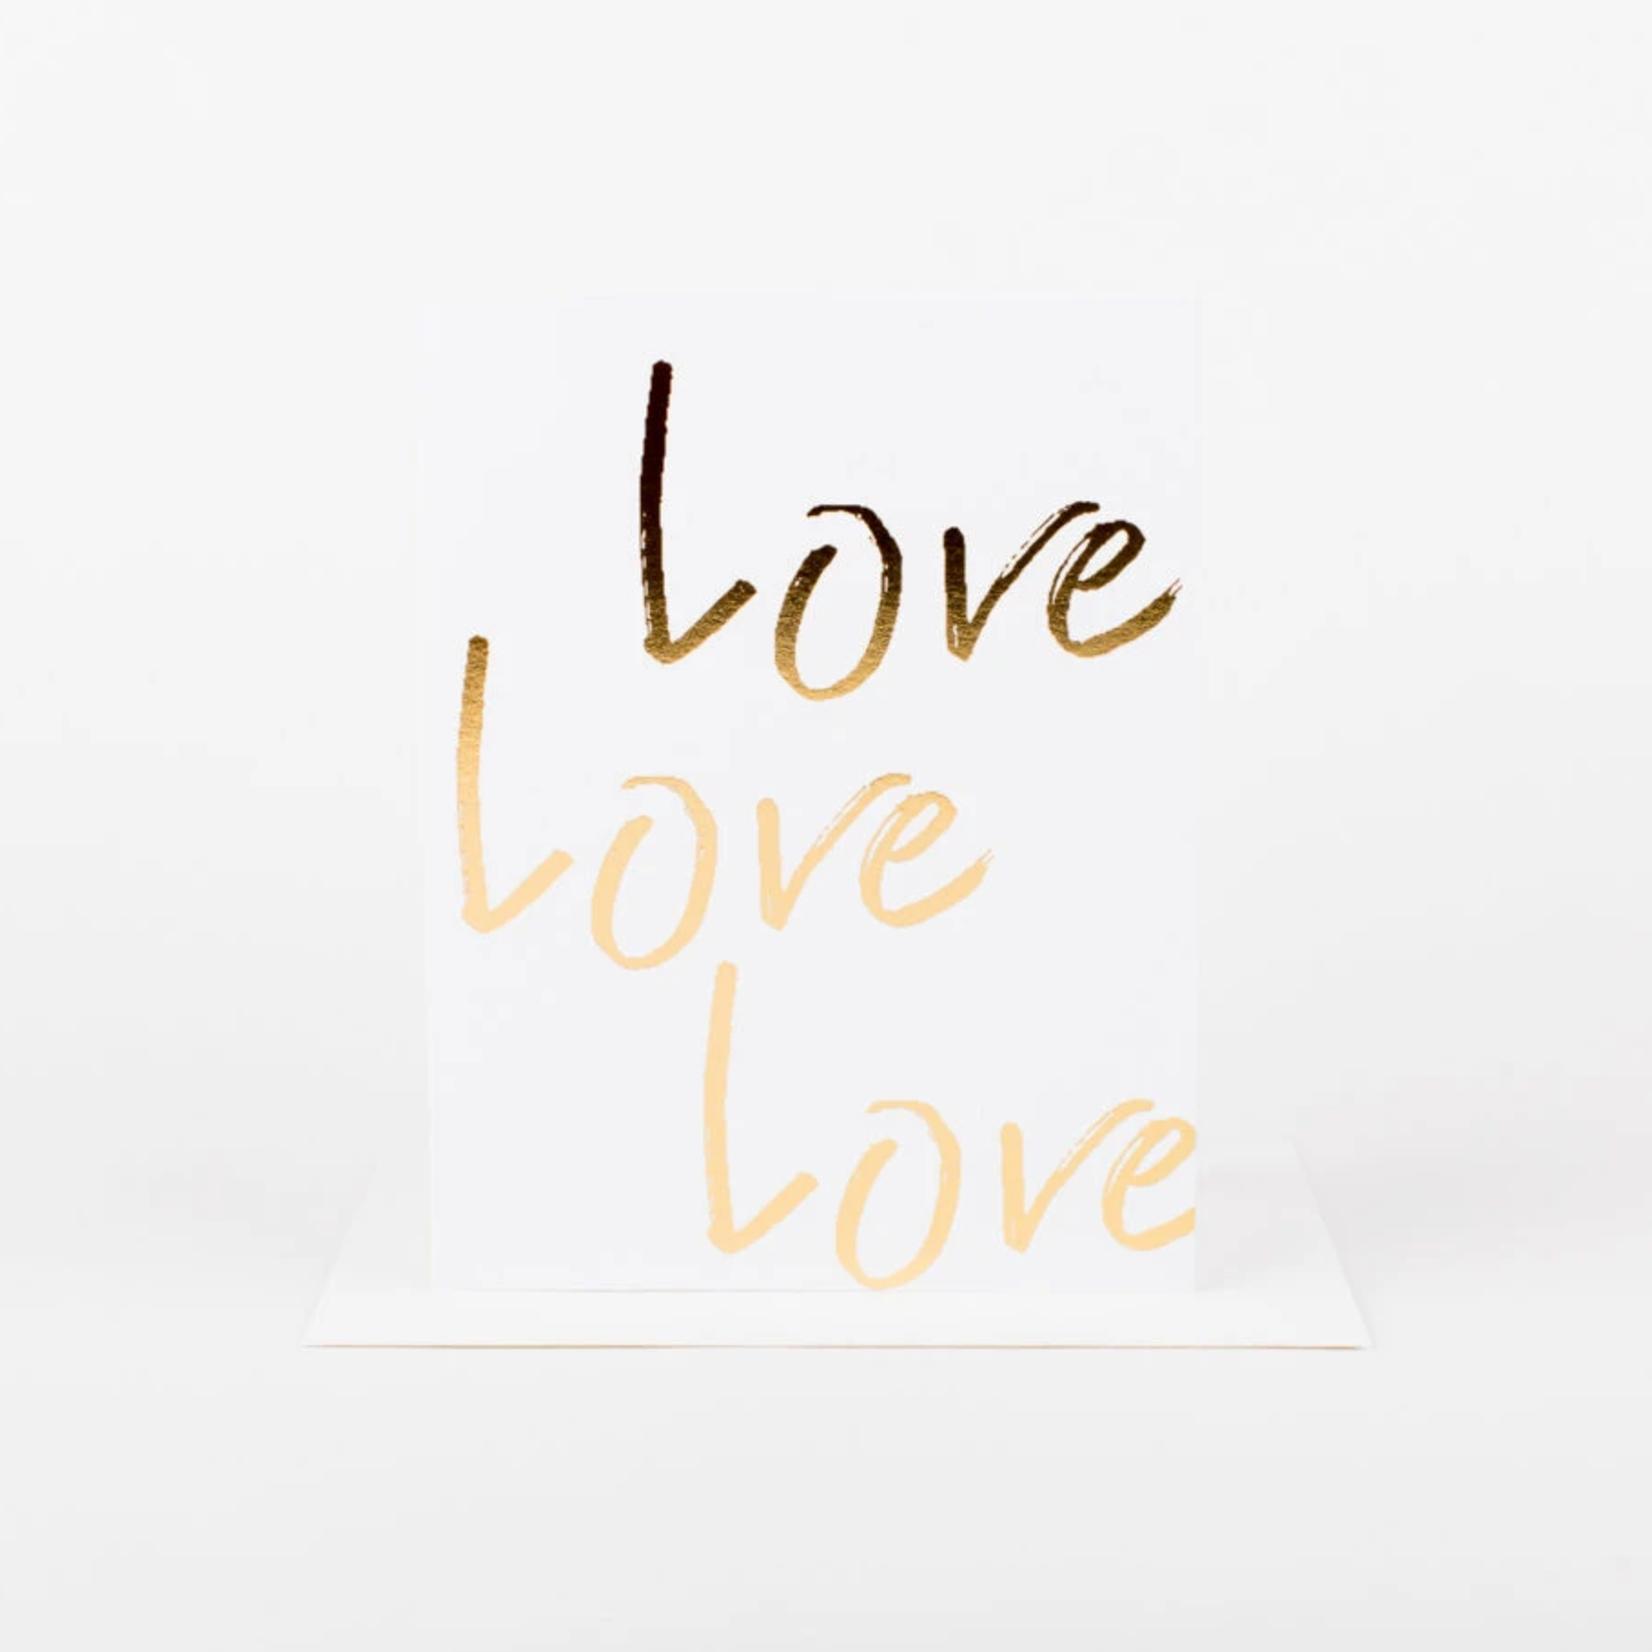 Wrinkle and Crease Love Love Love card